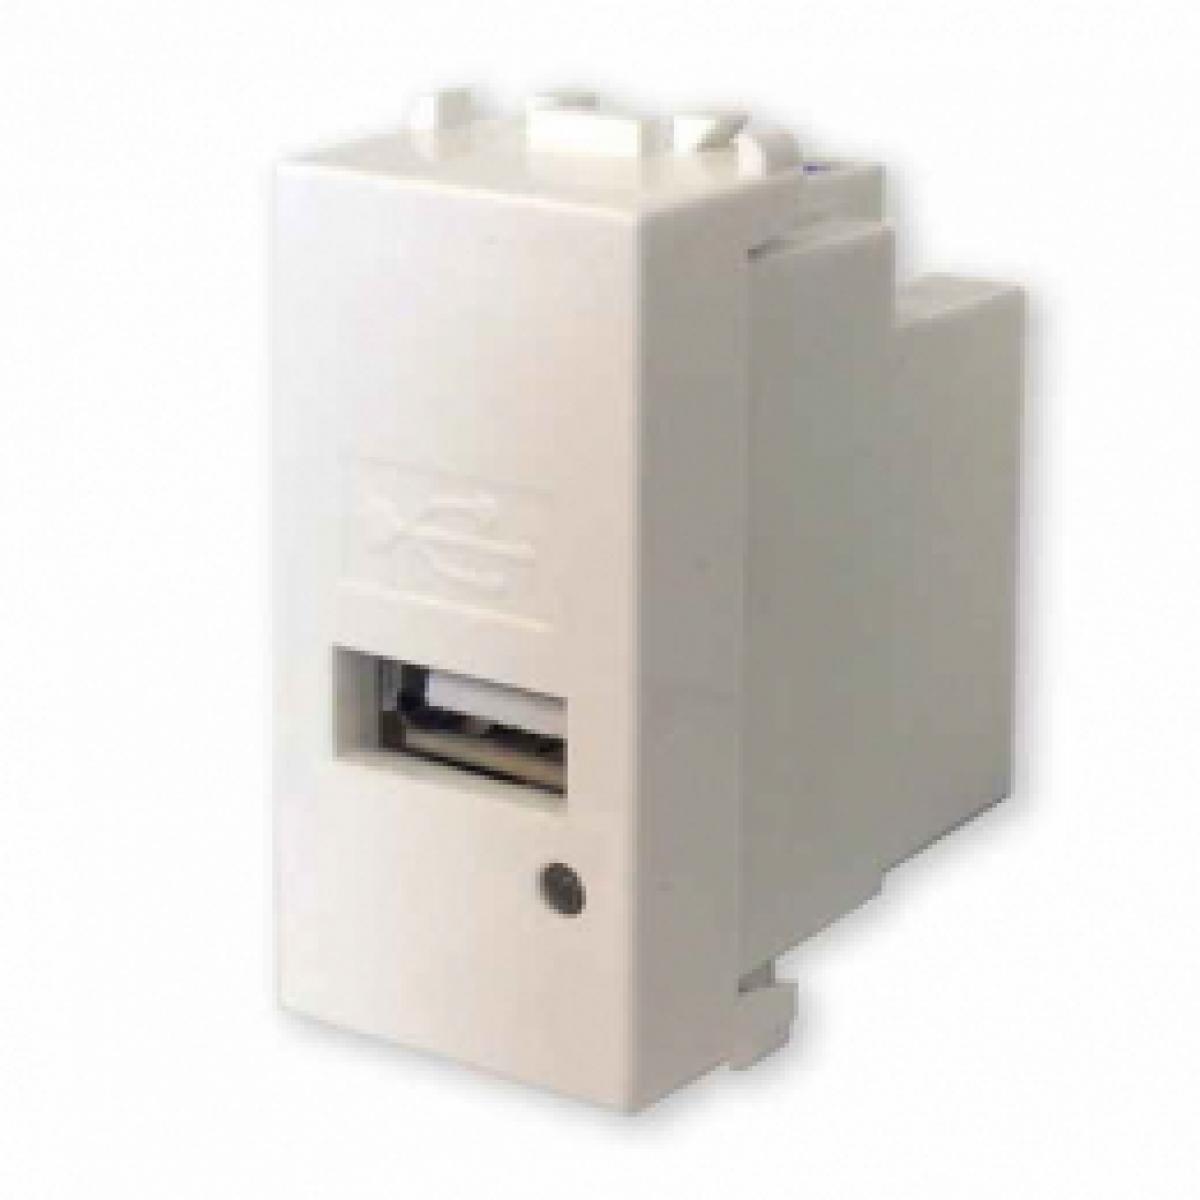 Mix presa caricabatteria USB 5V 1° 21213 master